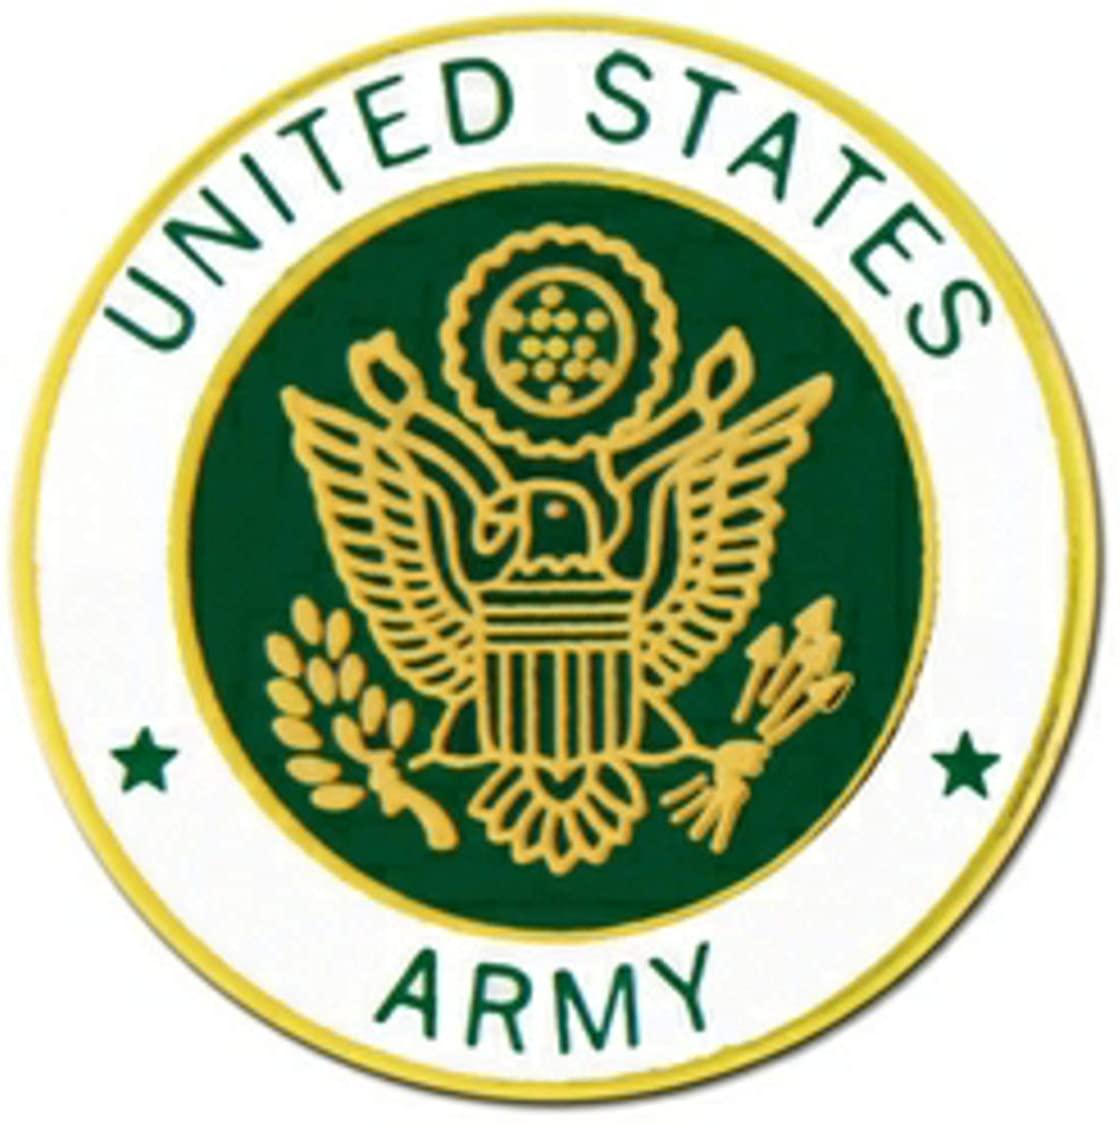 US Army Emblem Lapel Pin or Hat Pin (metal, 7/8